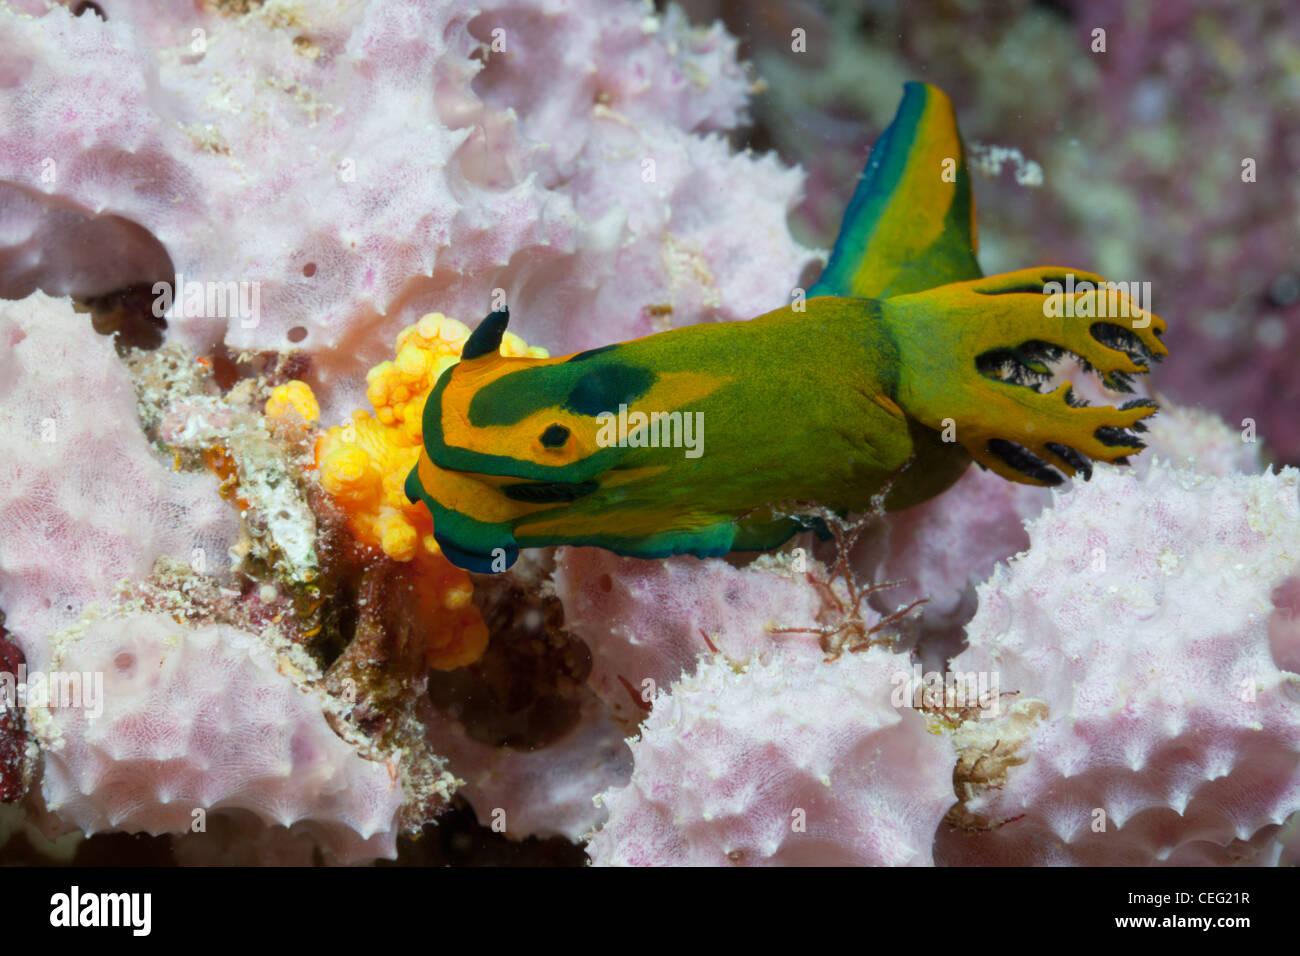 Sea Slug, Tambja olivaria, Baa Atoll, Oceano Indiano, Maldive Immagini Stock